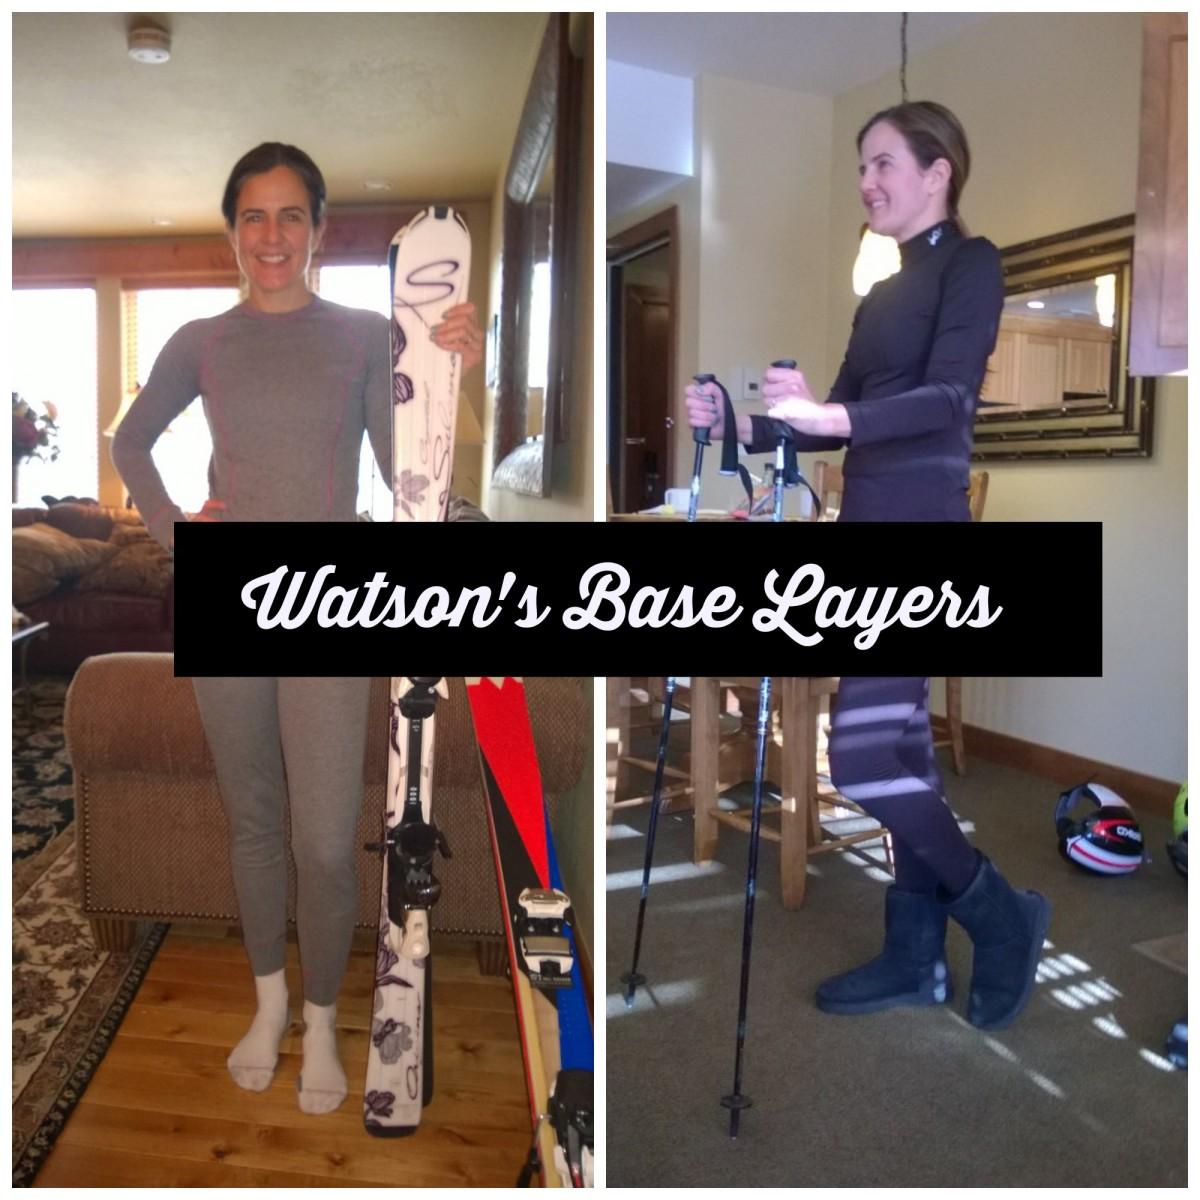 watson's base layers.jpg